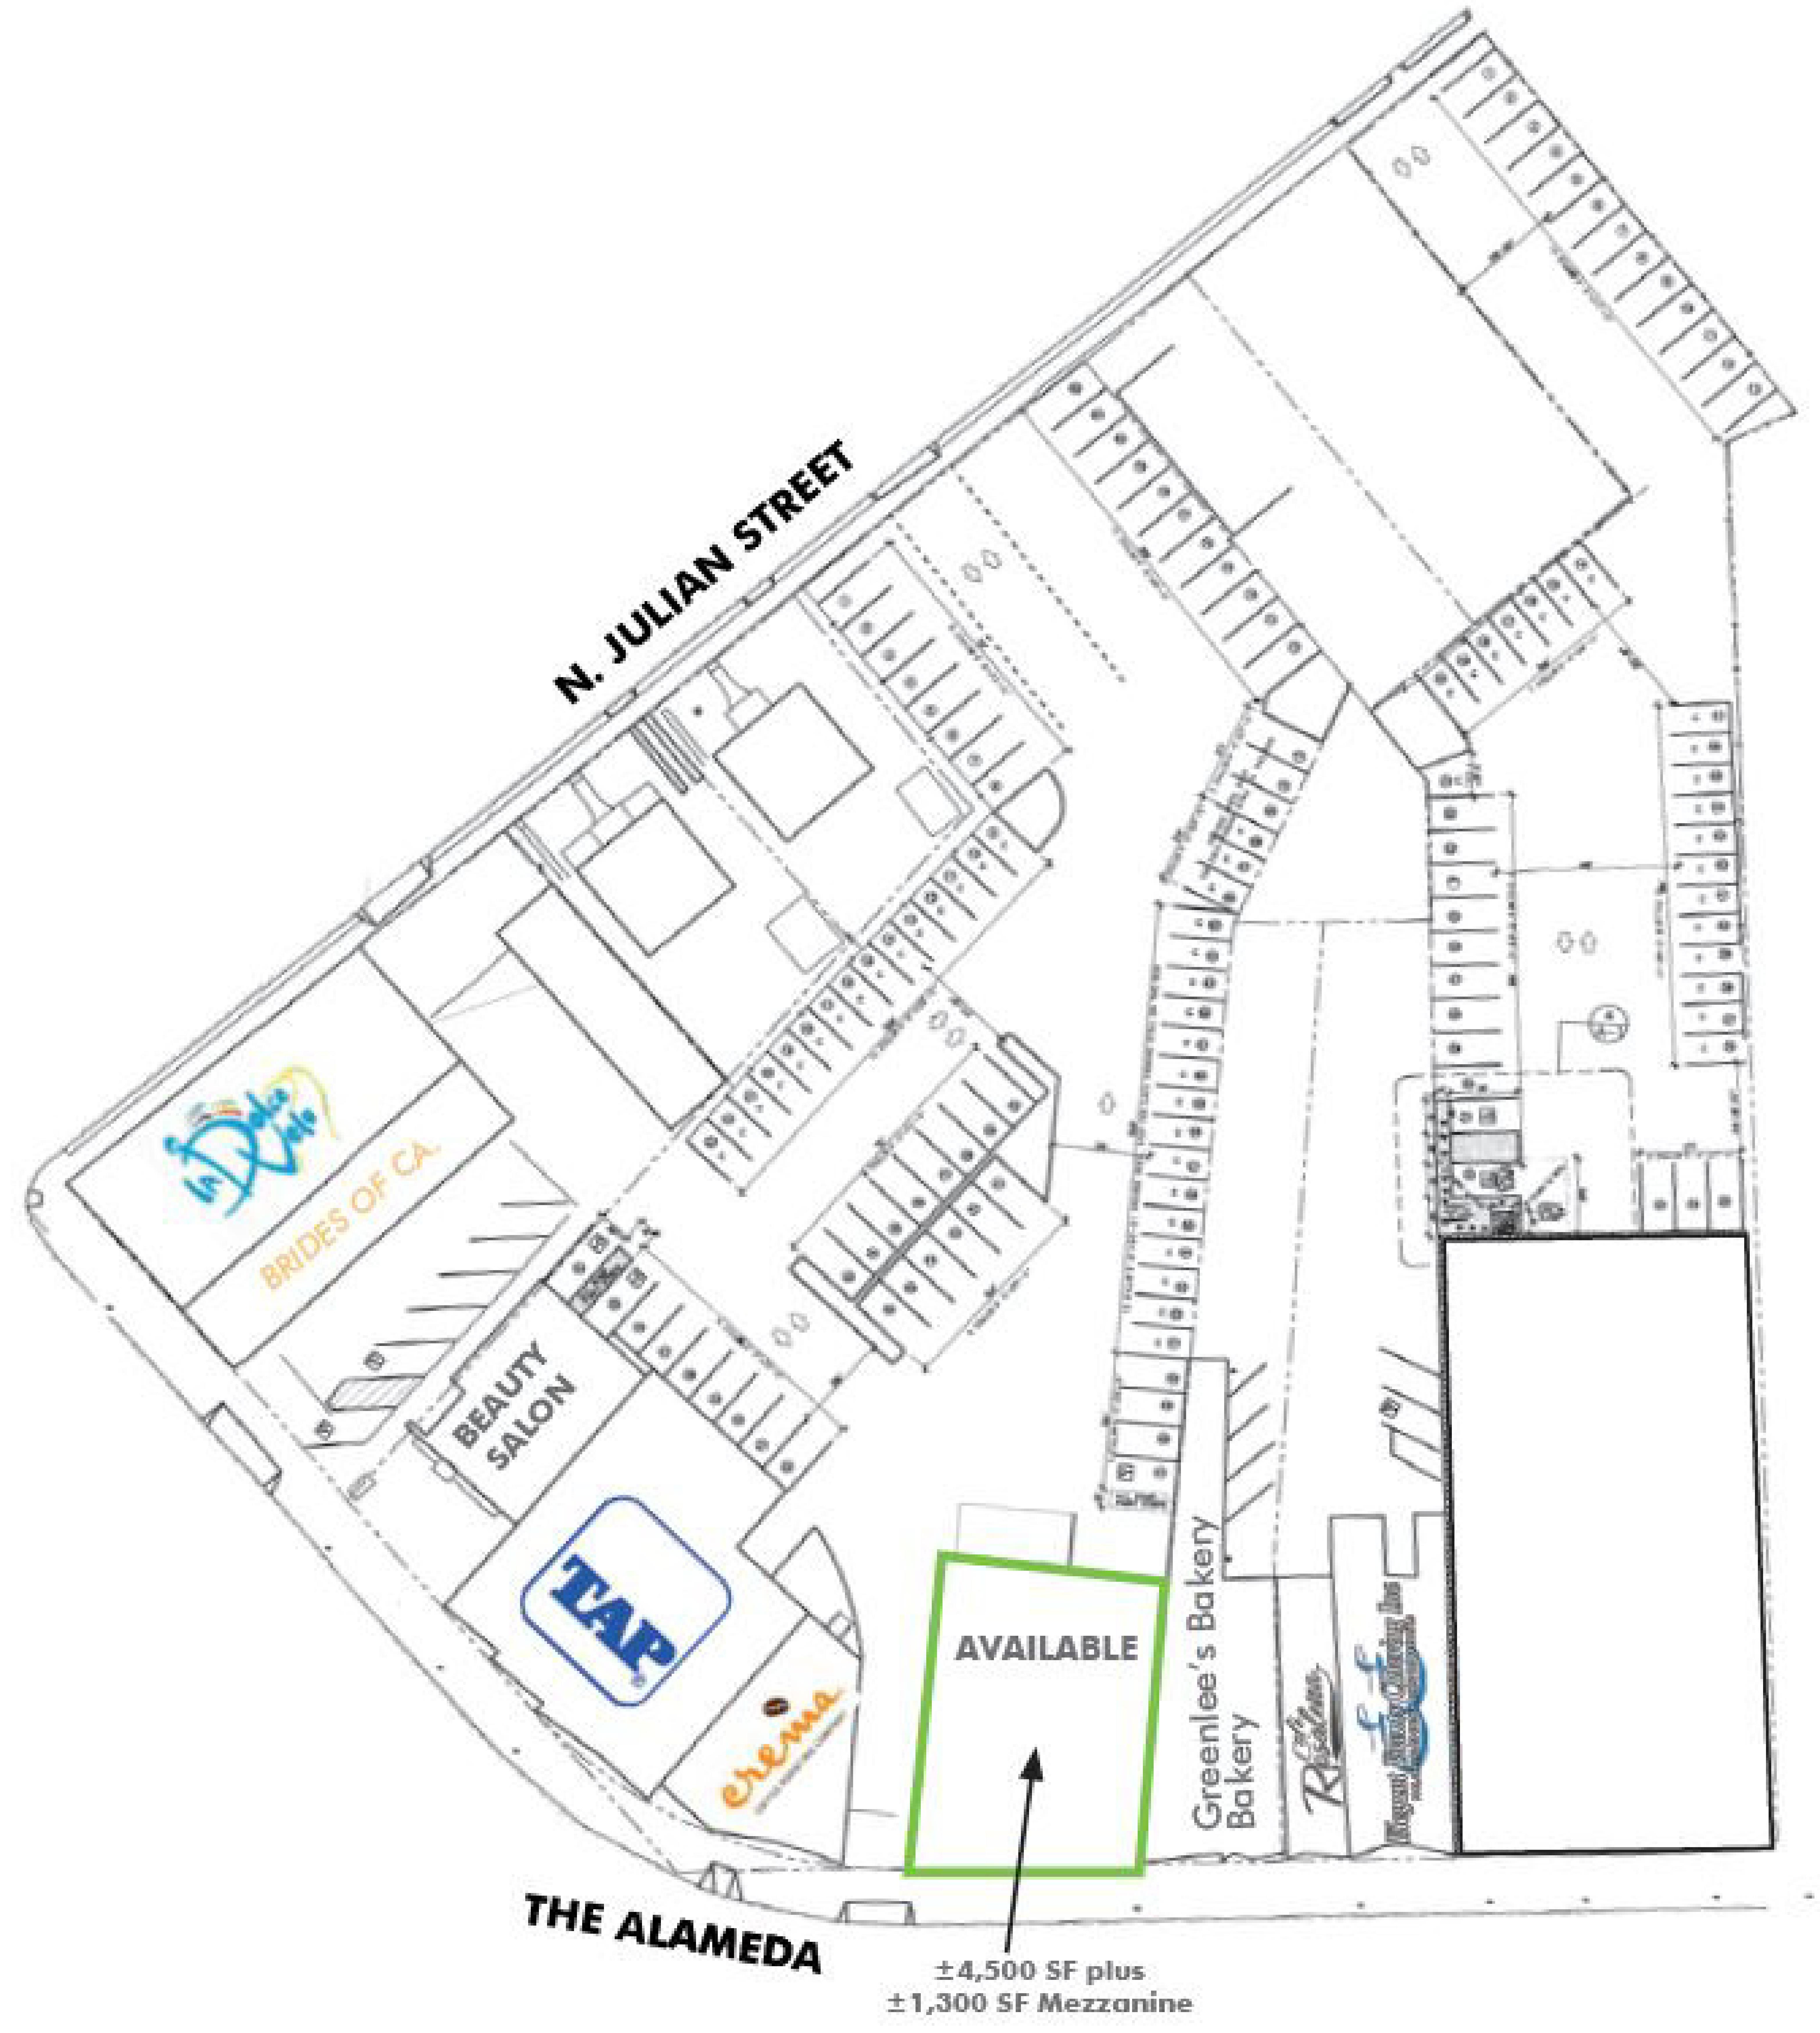 1085-1095 The Alameda: site plan